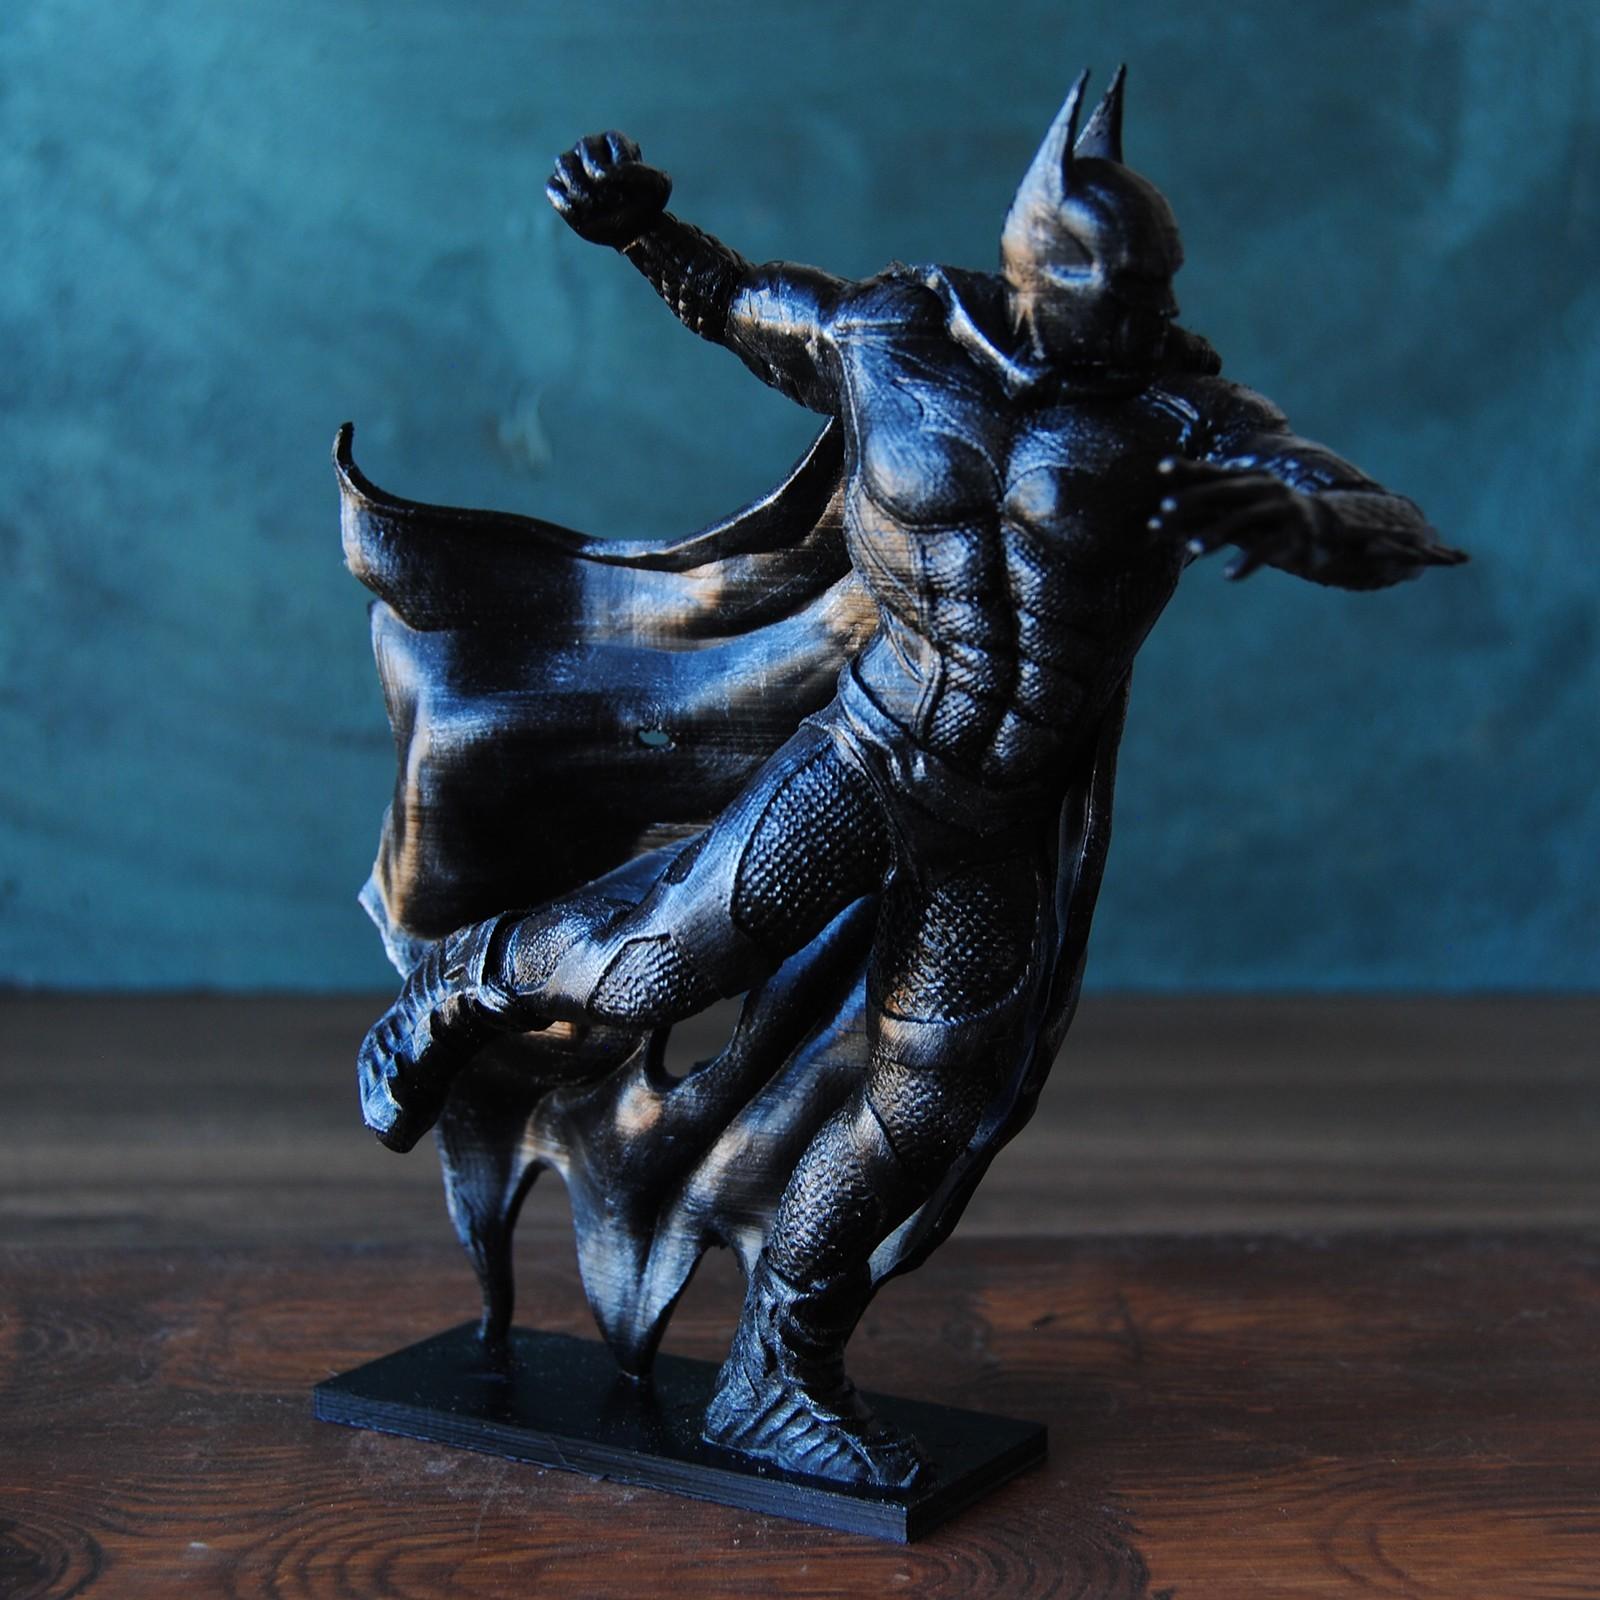 3.jpg Download OBJ file BATMAN Battle Pose • 3D print template, tolgaaxu